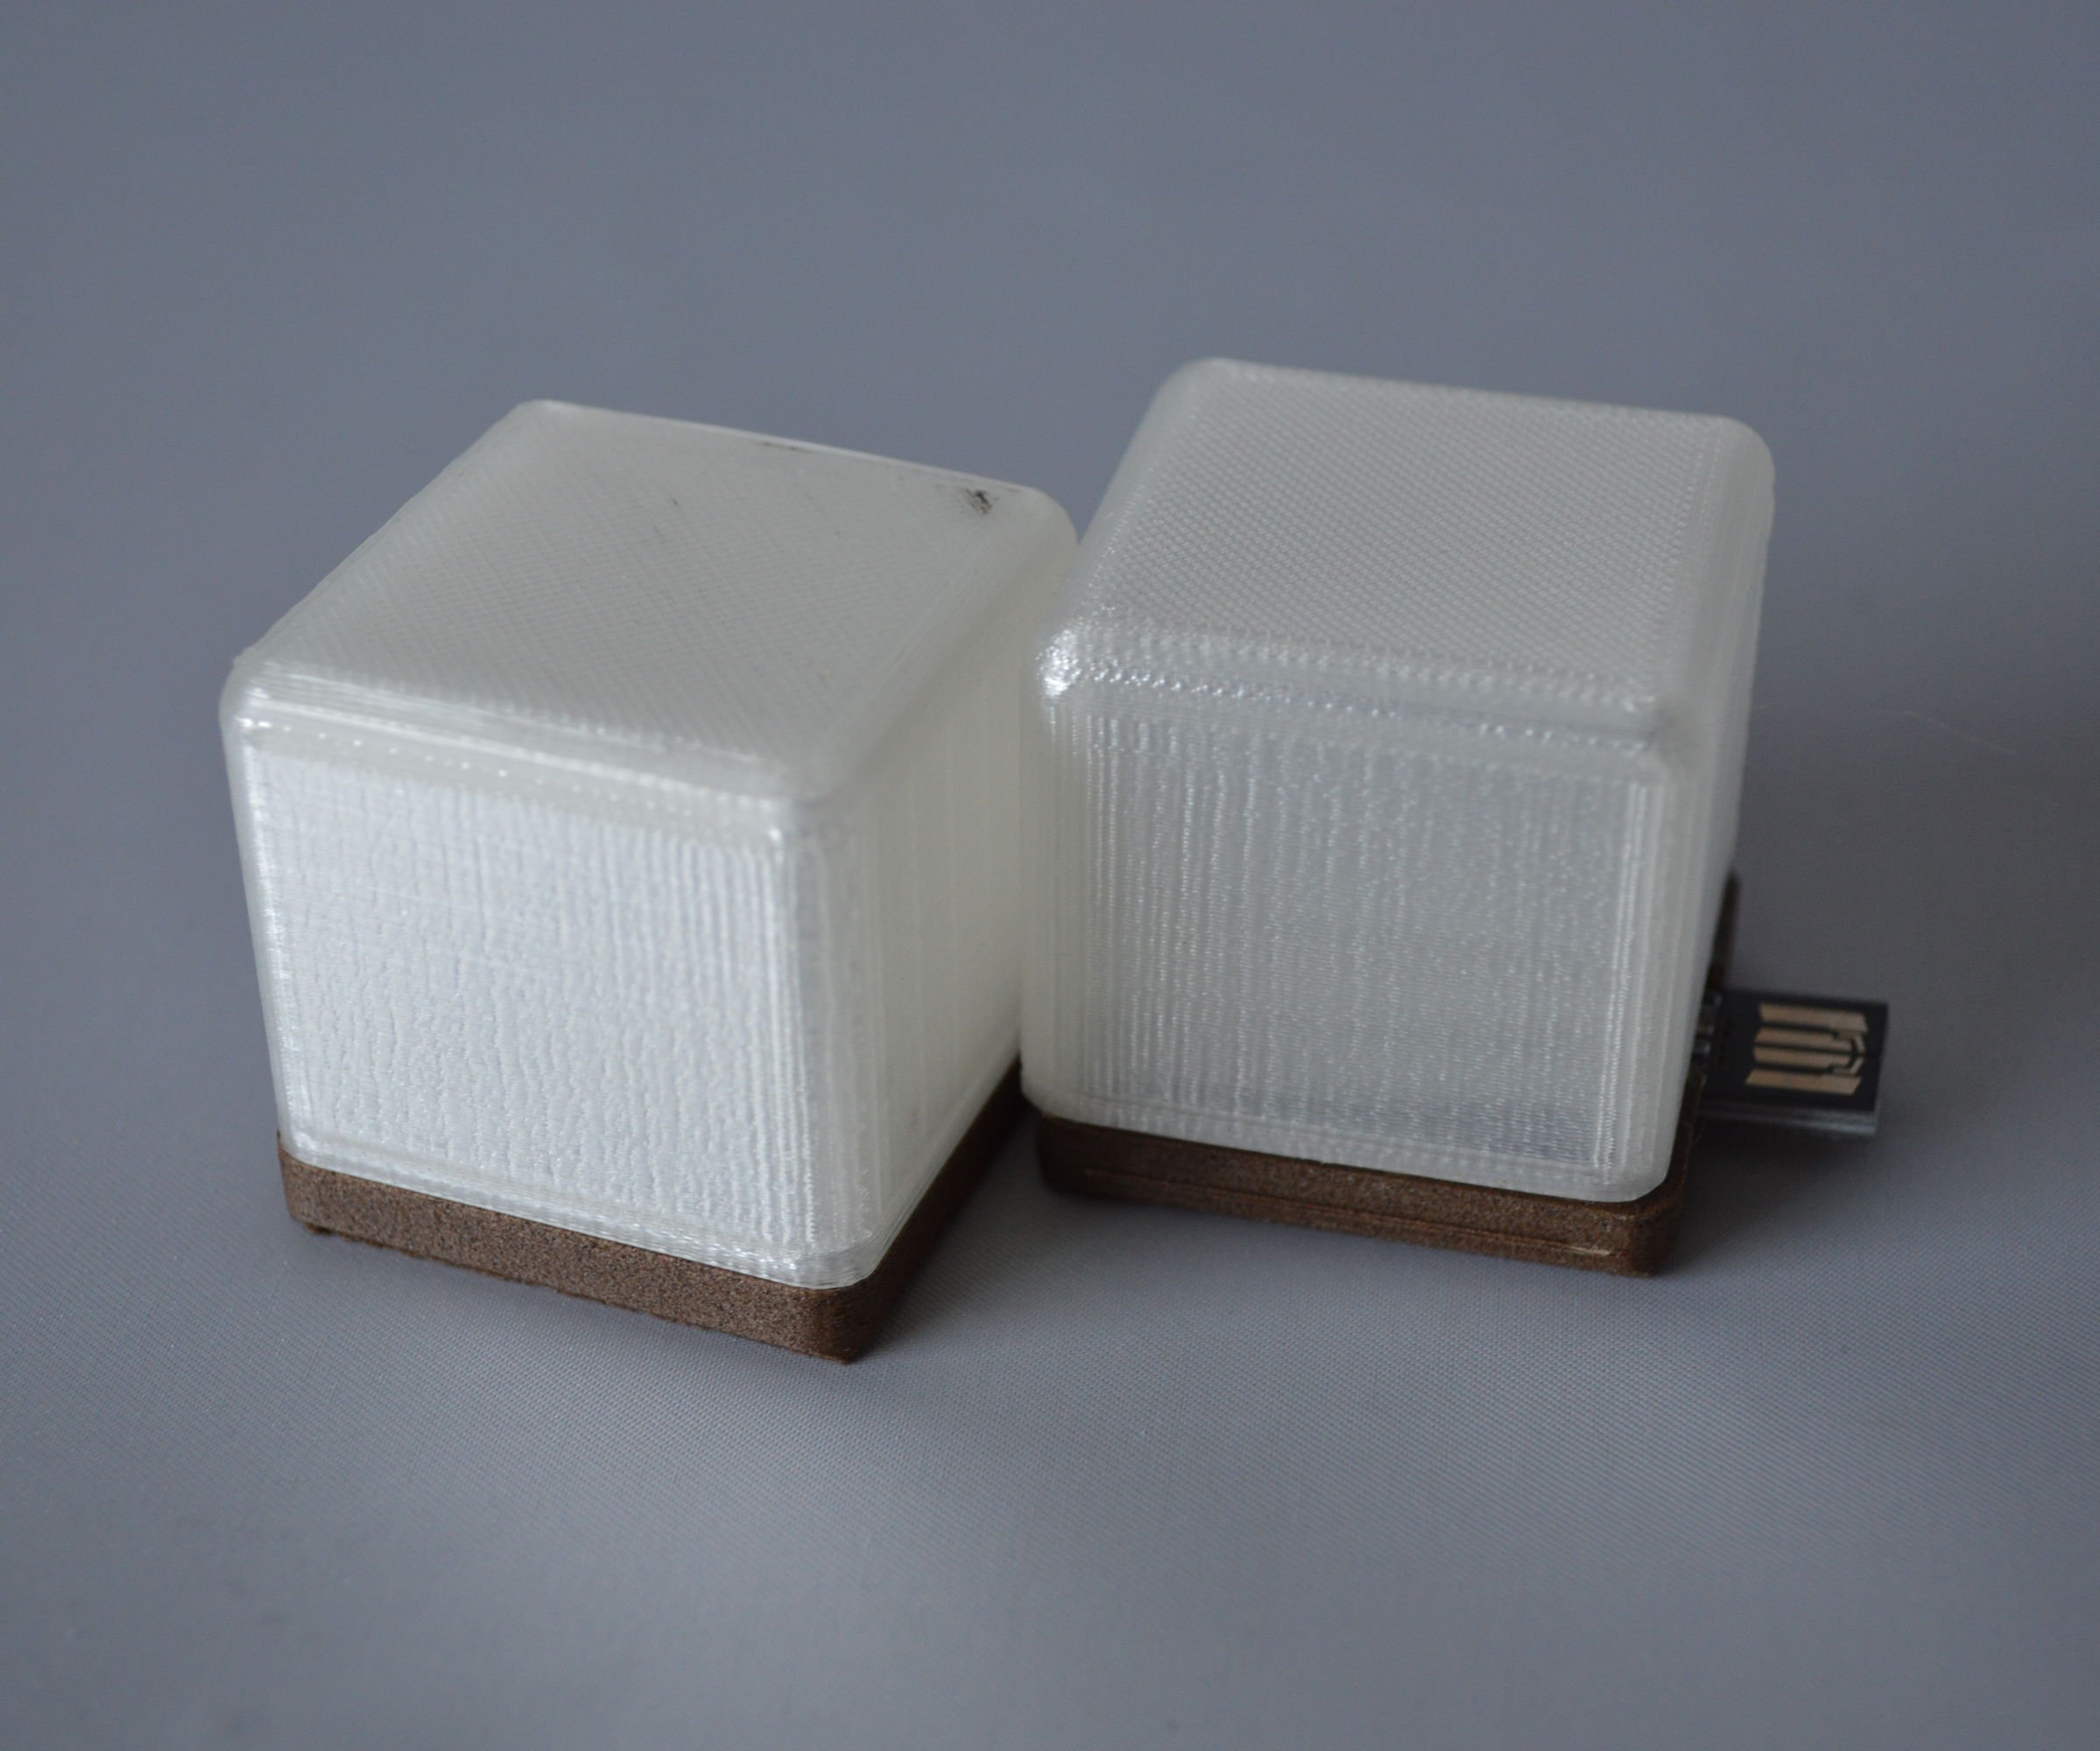 3D Printed USB Light Cubes